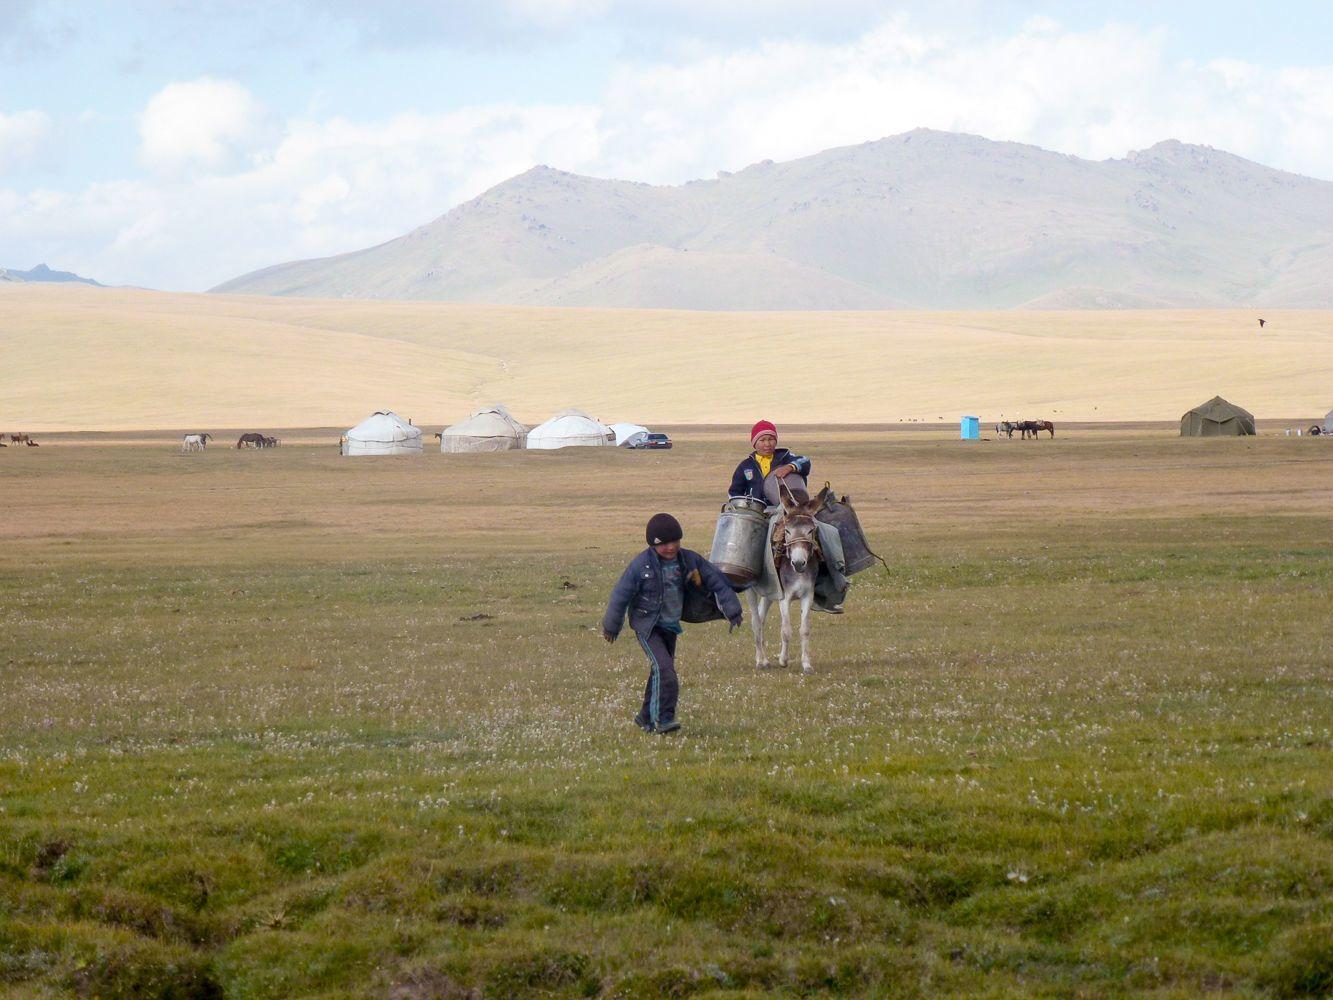 Kyrgyzstan, Song Kul, kids